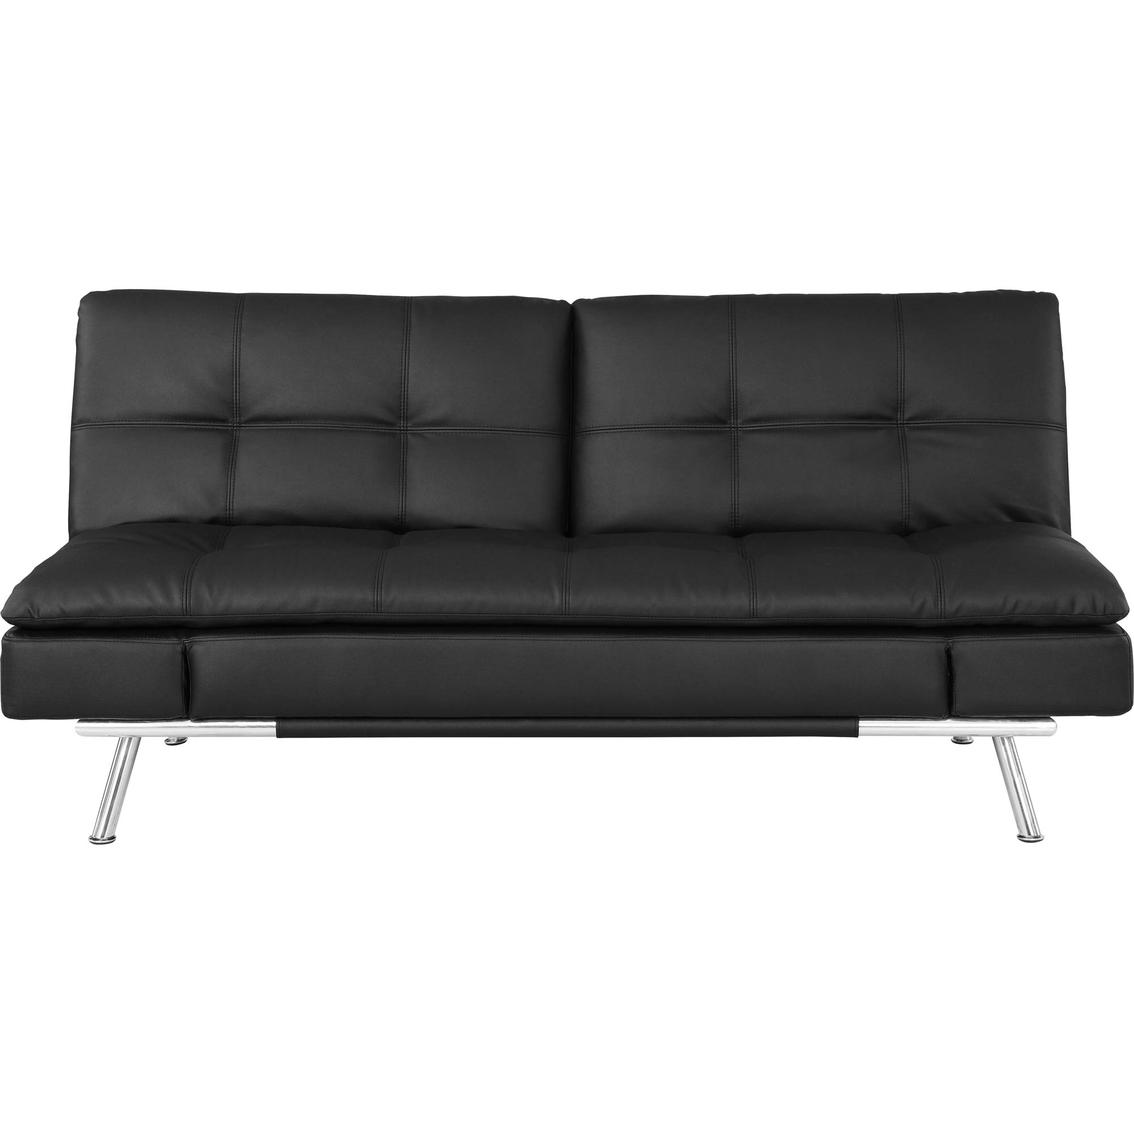 serta matrix convertible leather sleeper sofa black